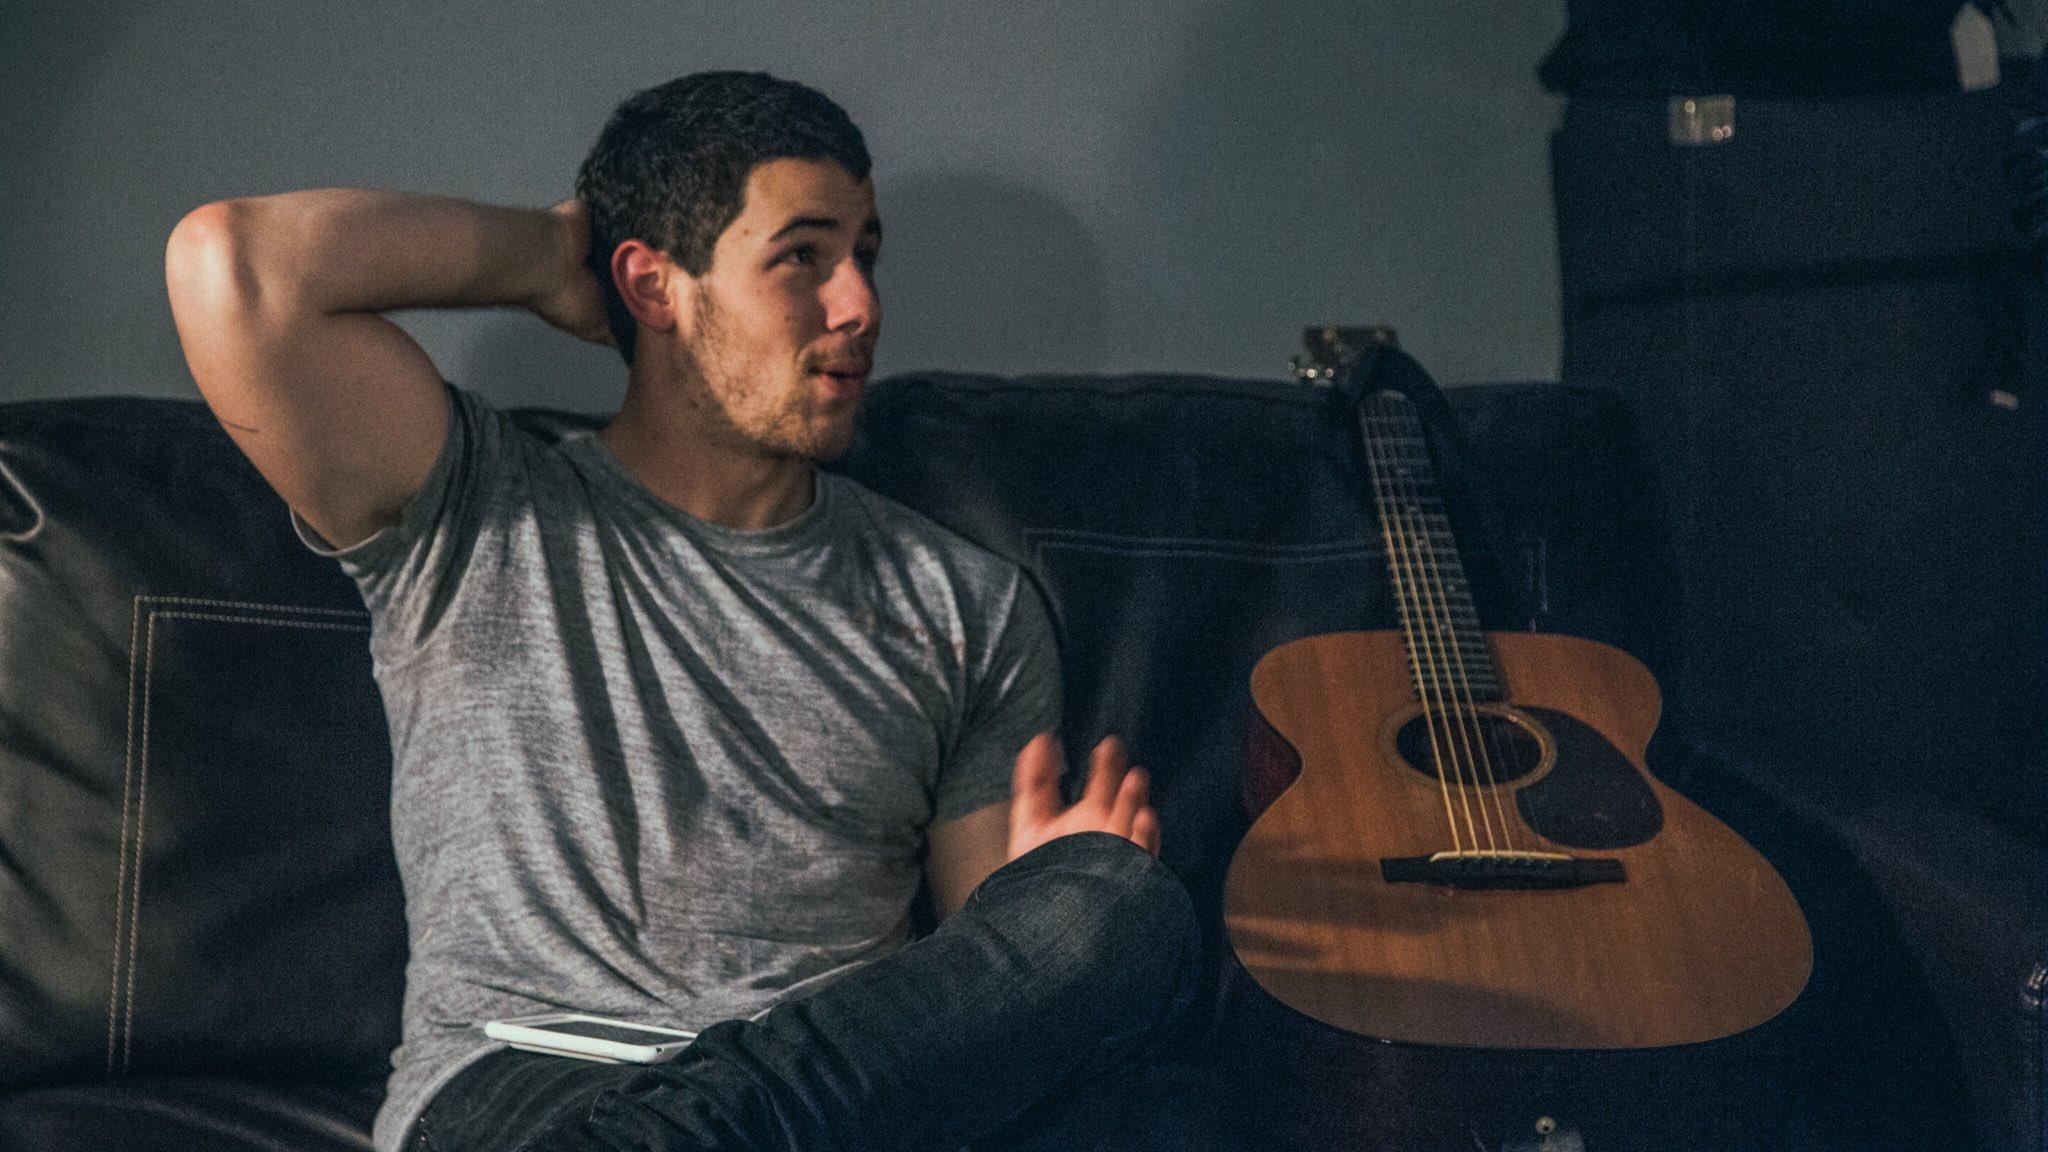 A man and his guitar. https://t.co/EicDjhMZkN